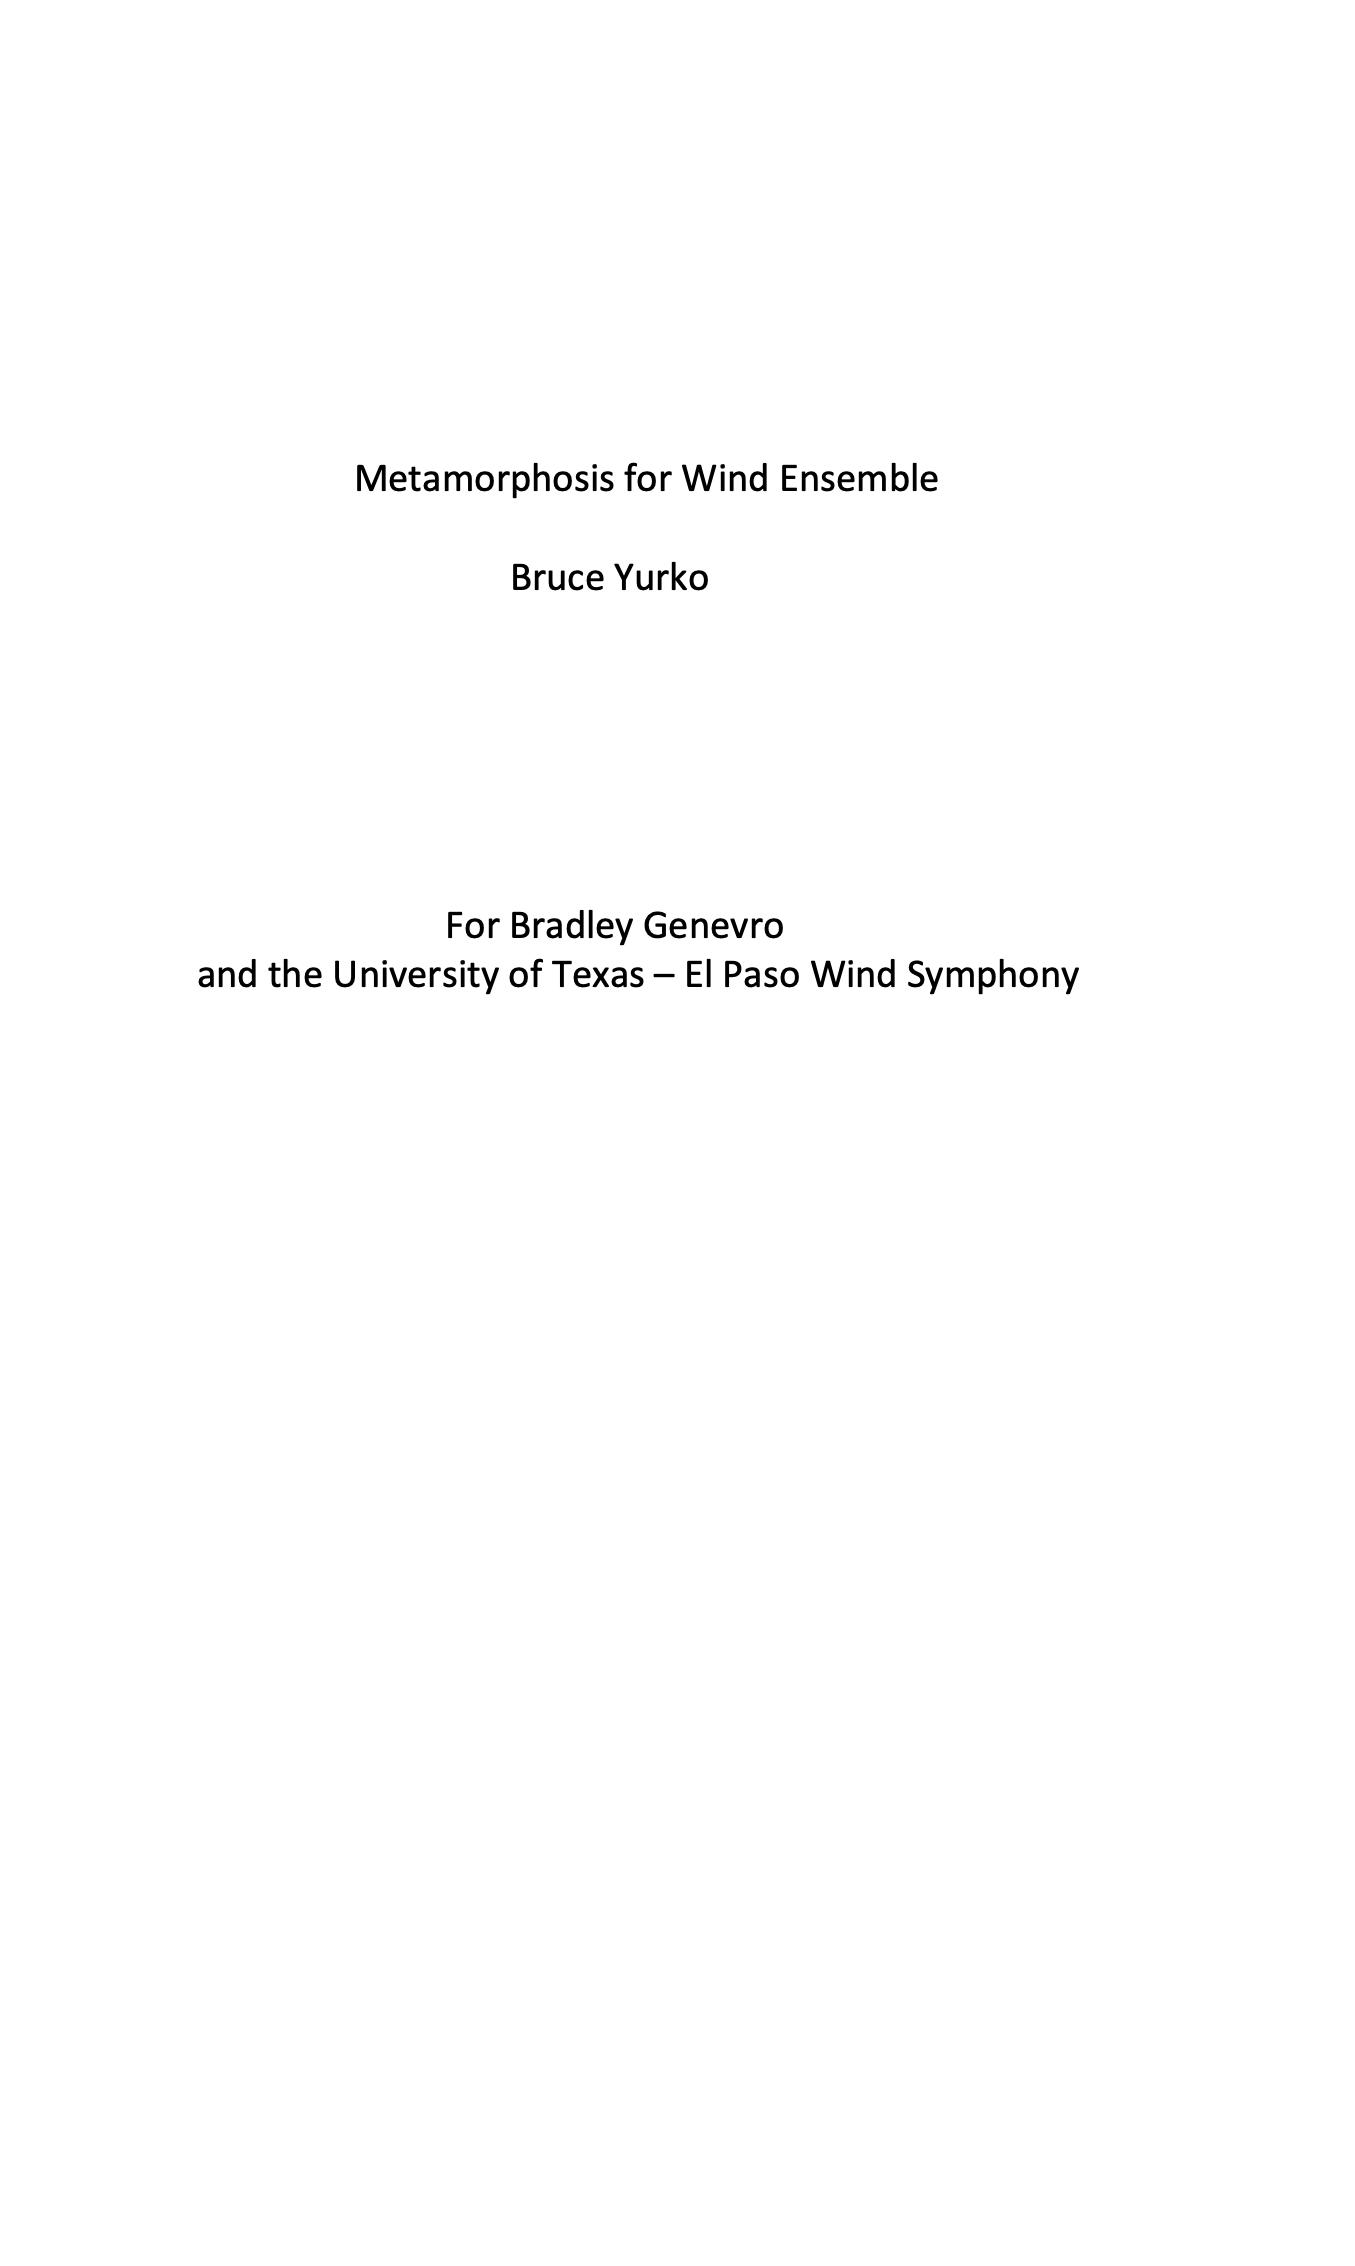 Metamorphosis For Wind Ensemble (Score Only) by Bruce Yurko